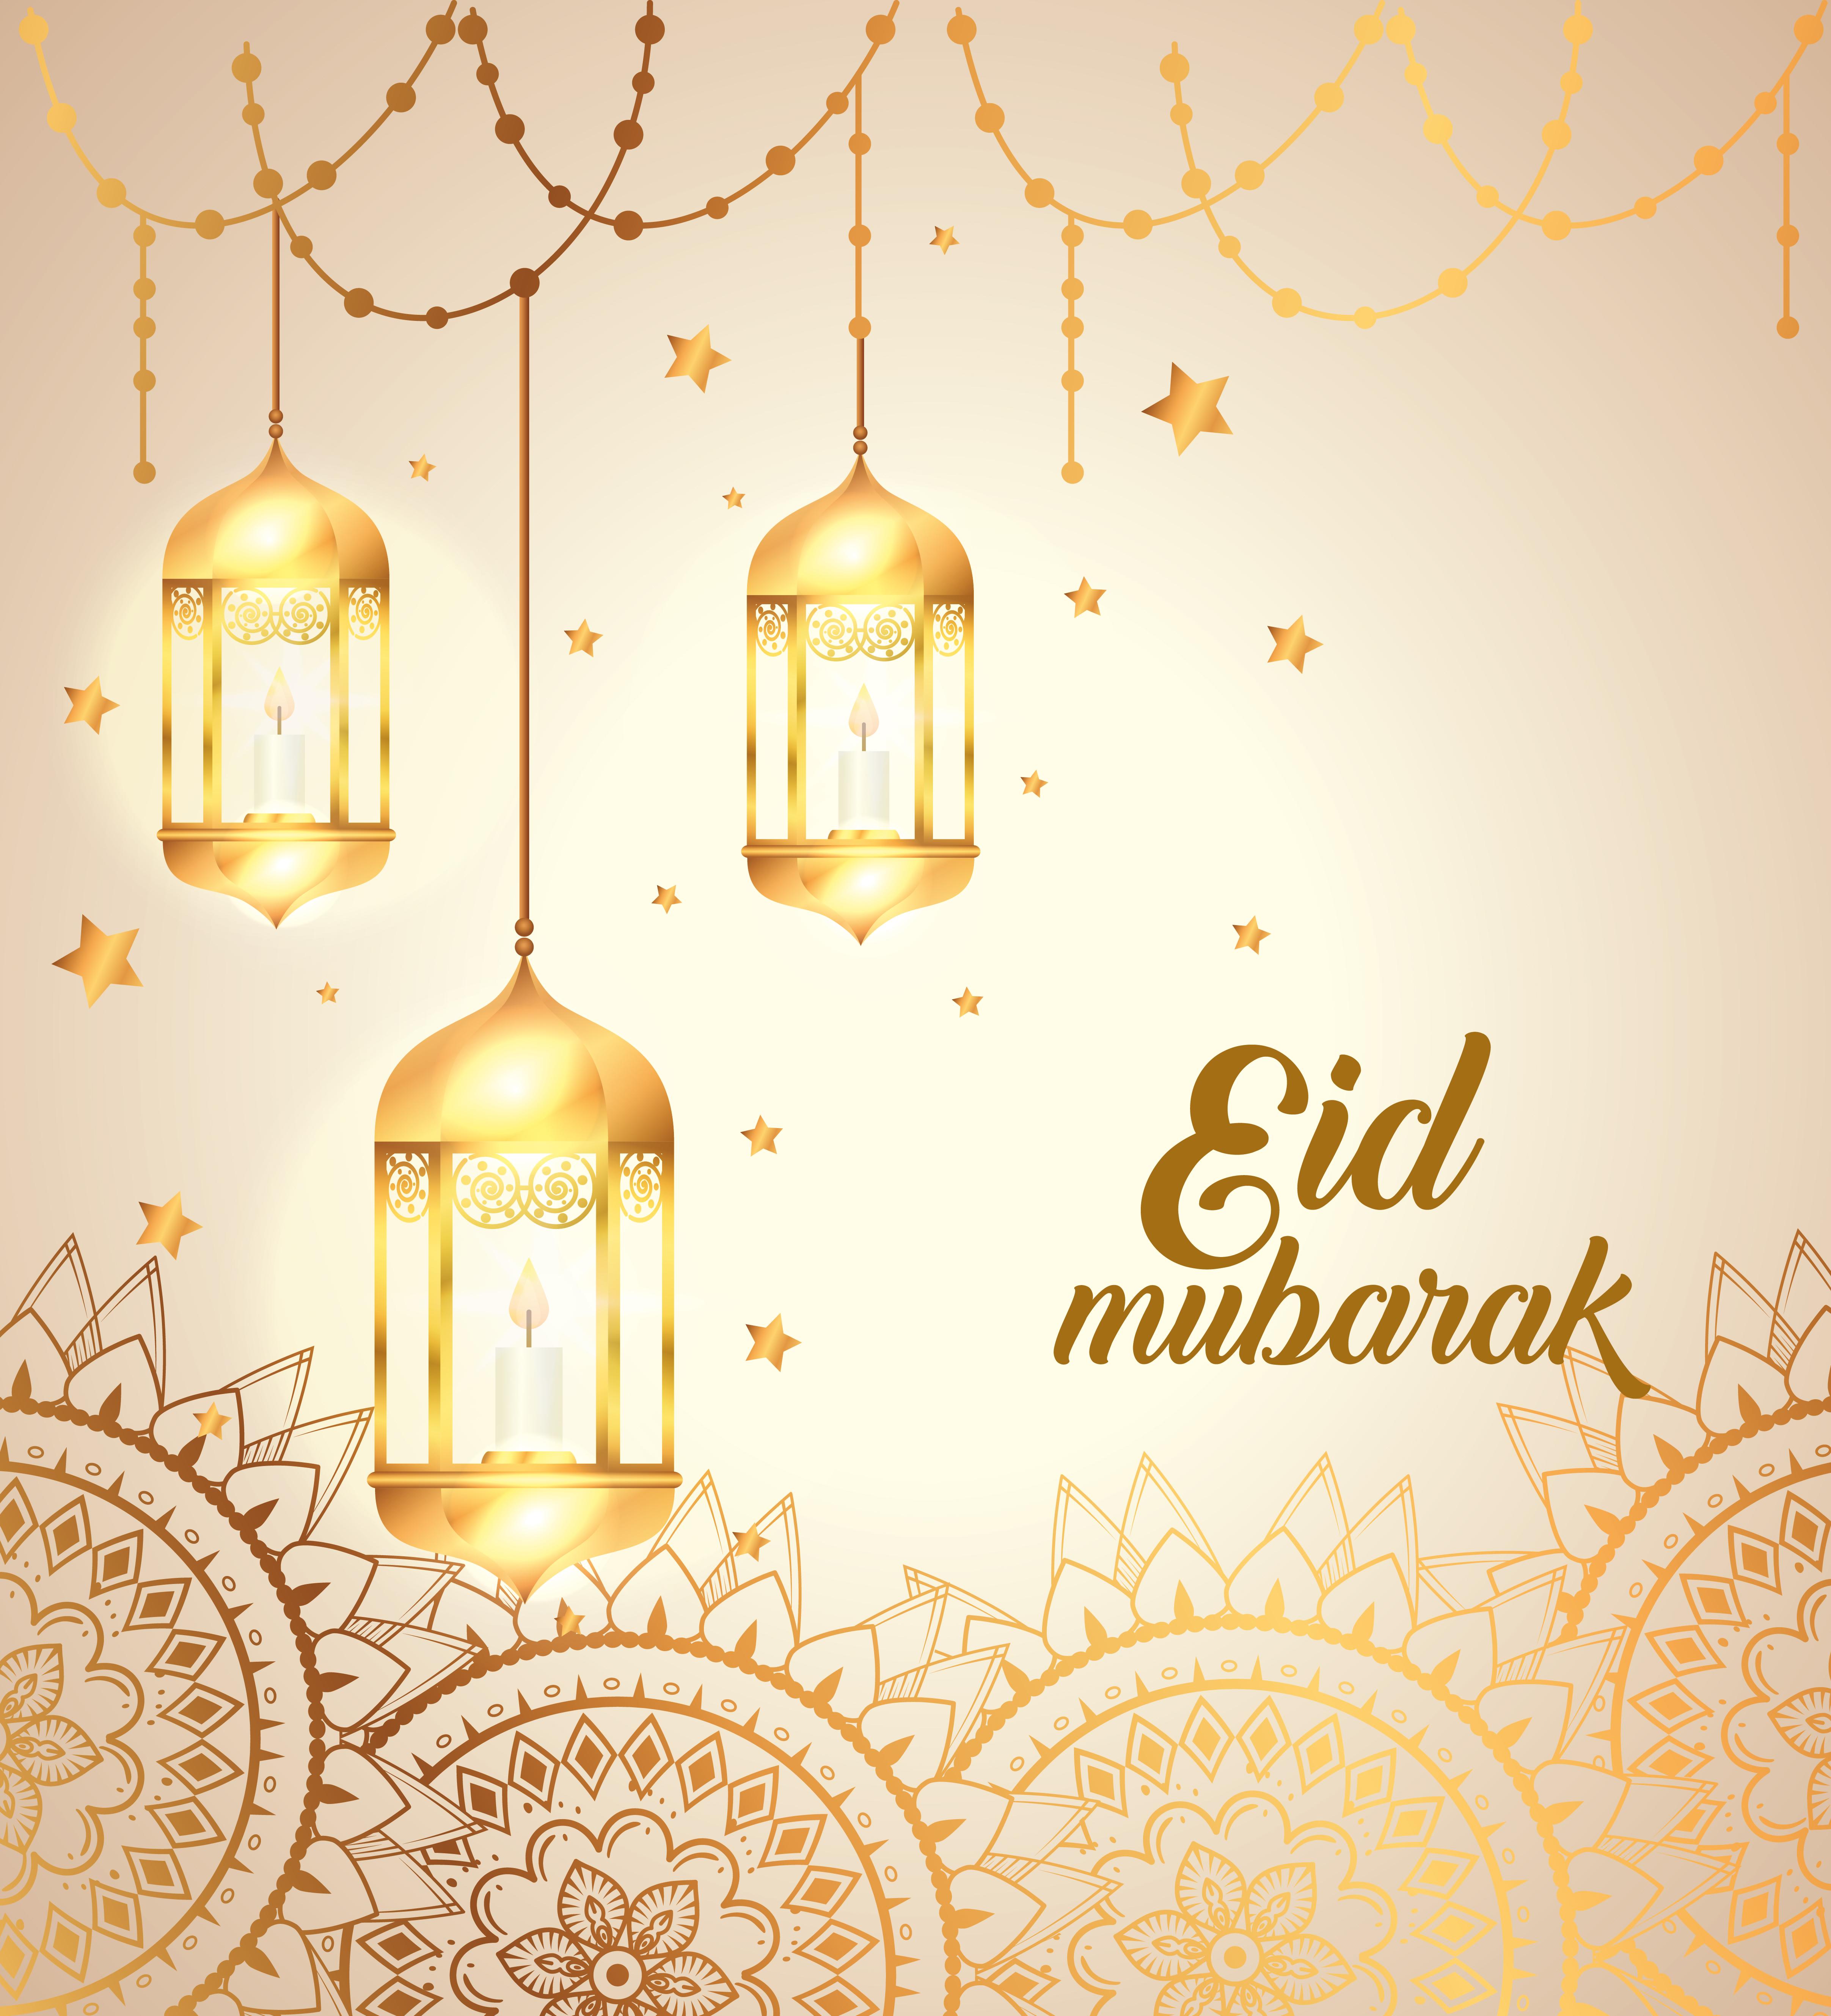 Eid Mubarak Poster With Lanterns Hanging And Mandalas 1997931 Download Free Vectors Clipart Graphics Vector Art